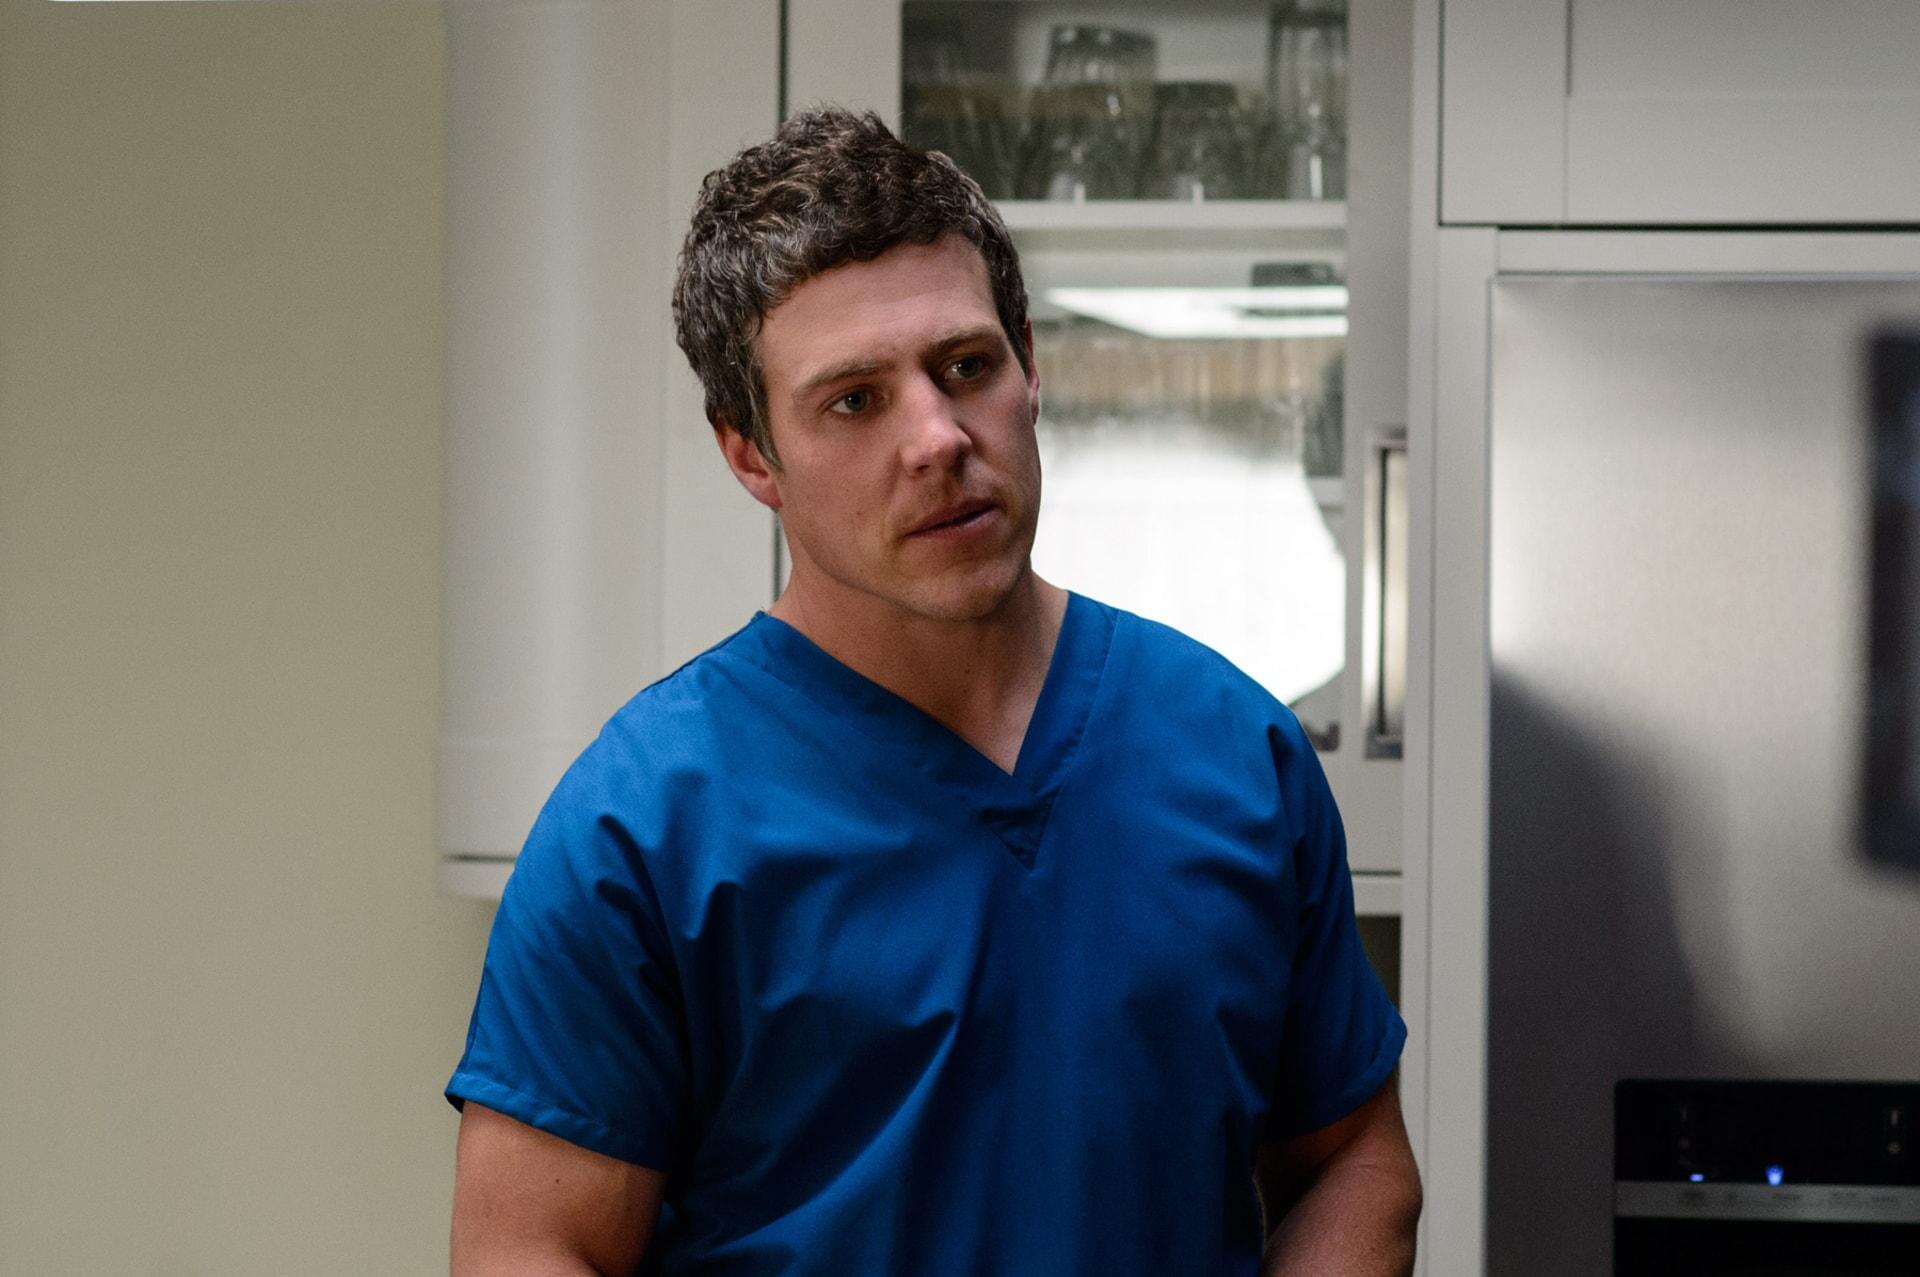 STEPHEN PEACOCKE as Nathan wearing hospital scrubs.